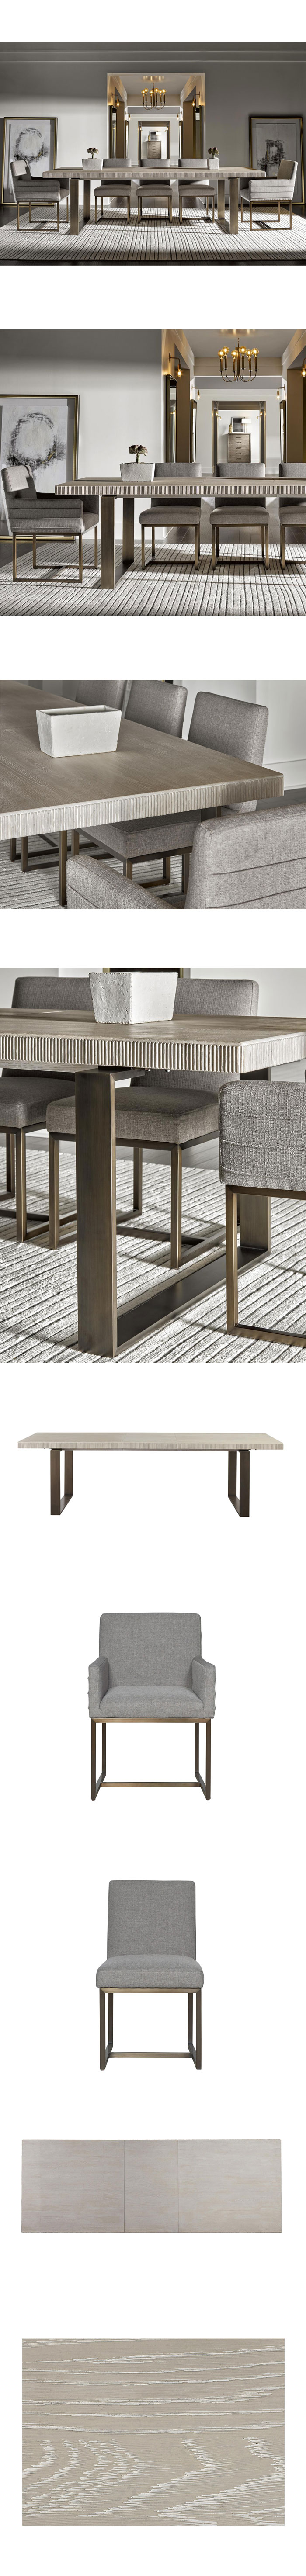 Robards-Rectangular-Dining-Table-full700